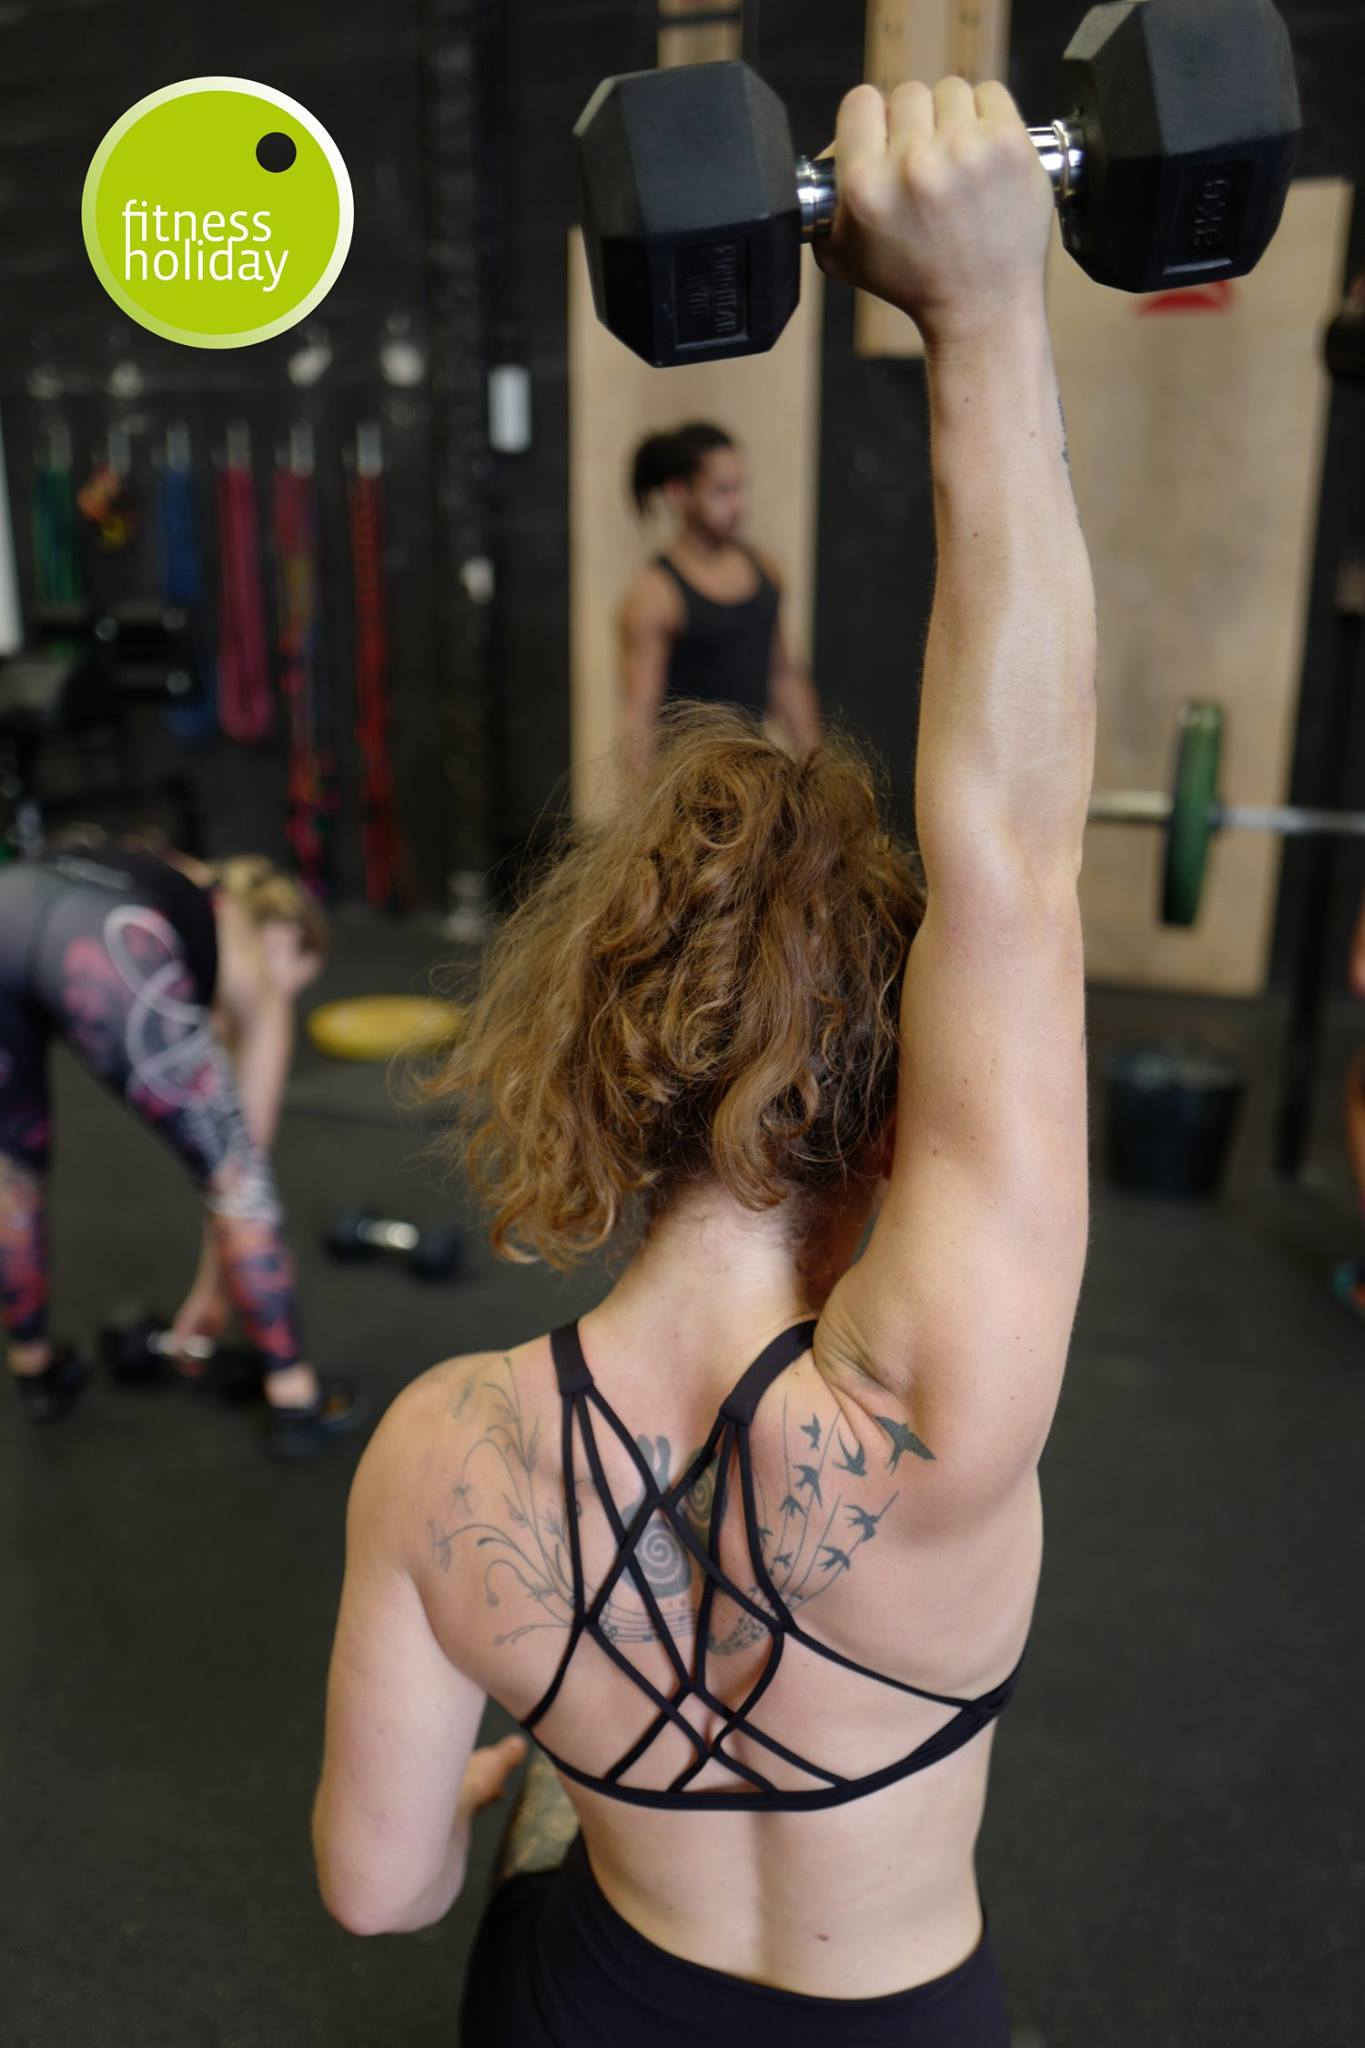 CrossFit Mallorca Functional Bodybuilding Coach Malick Fitnessholiday